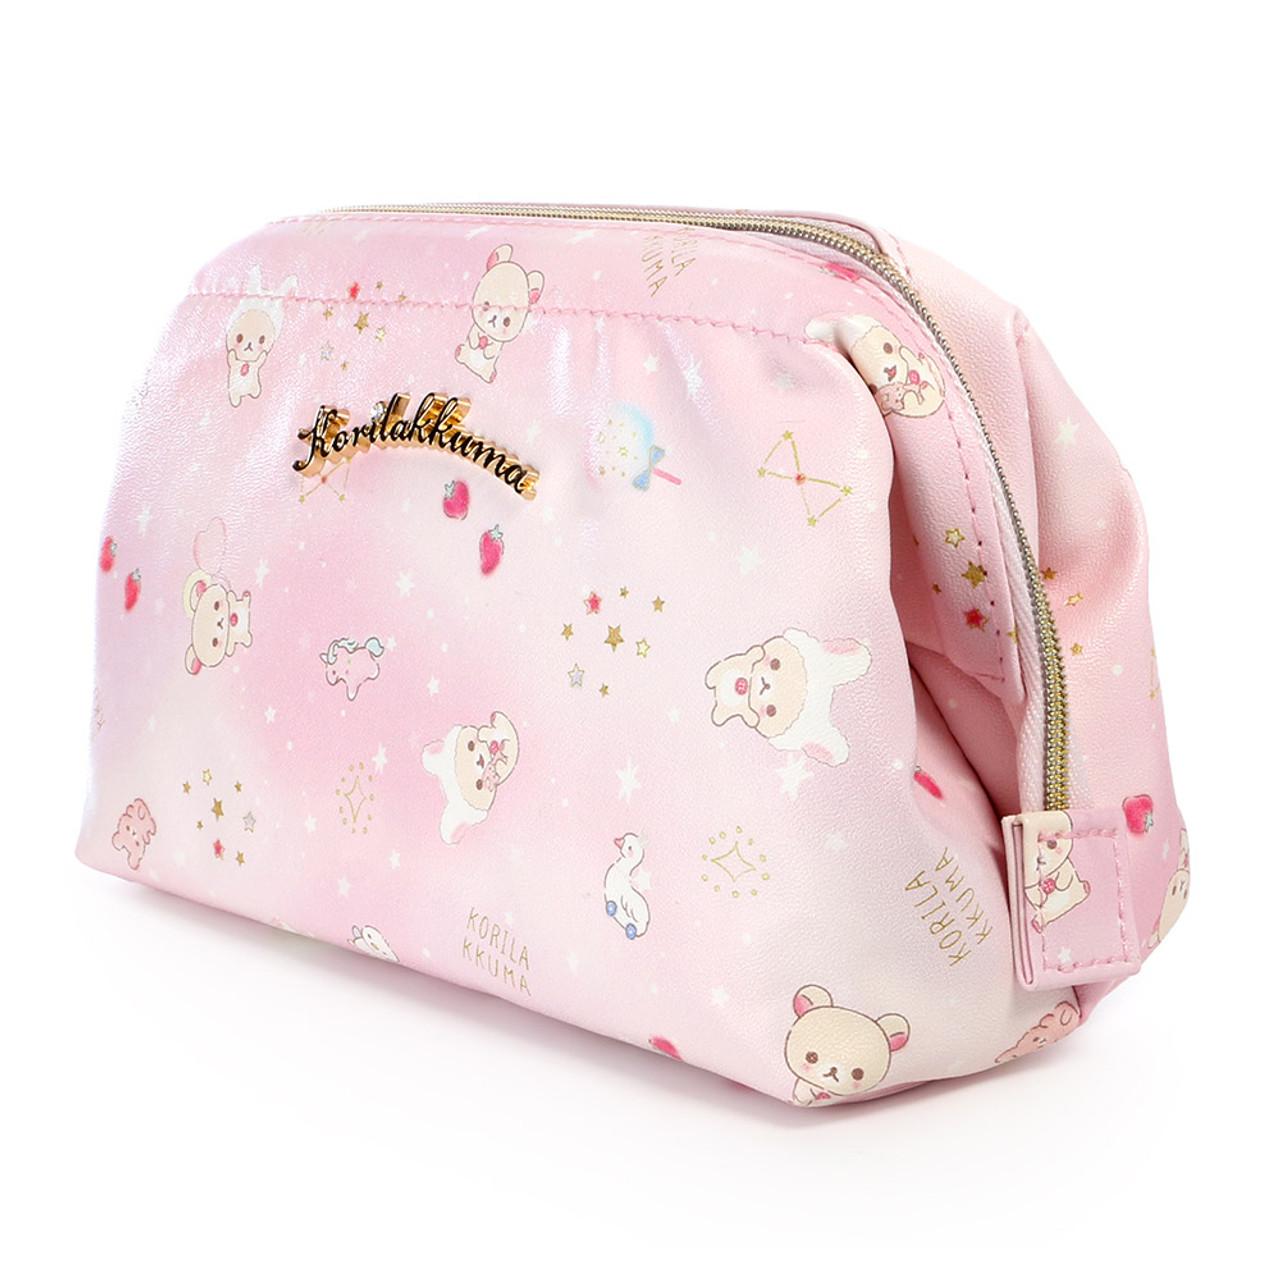 Korilakkuma Pink Fantasty Dream Pouch ( Side View )